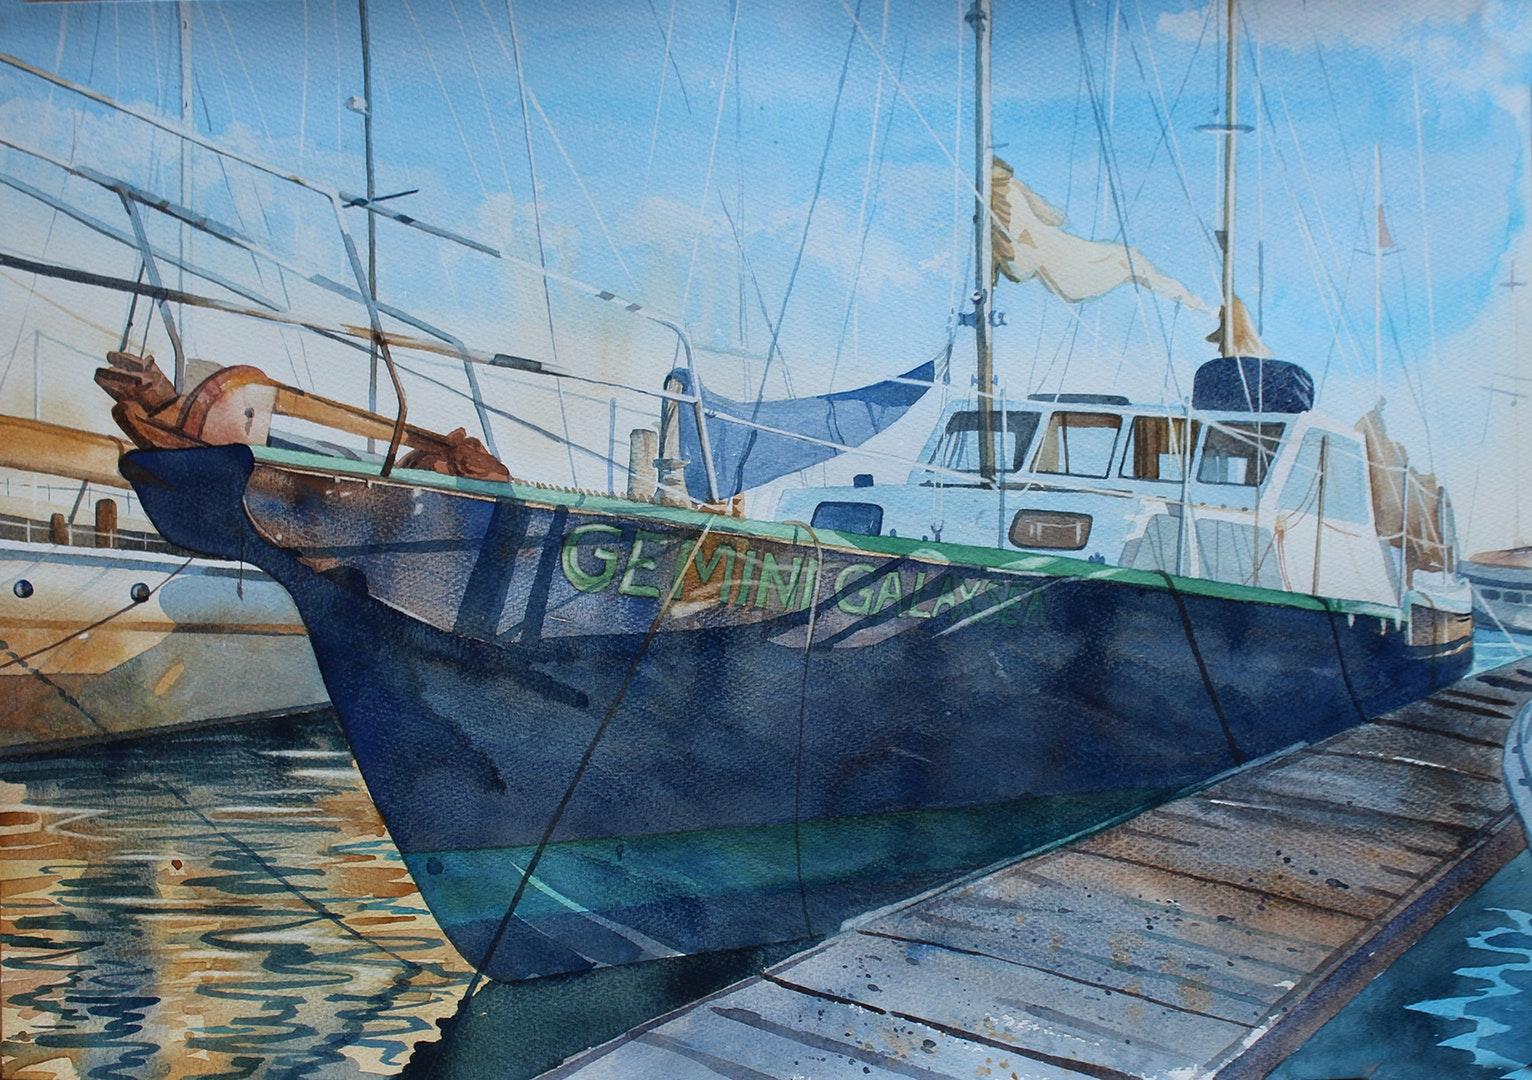 Sophie Penstone  Gemini Galaxsea  Watercolour, 42 x 59 cm  http://www.penstoneart.com